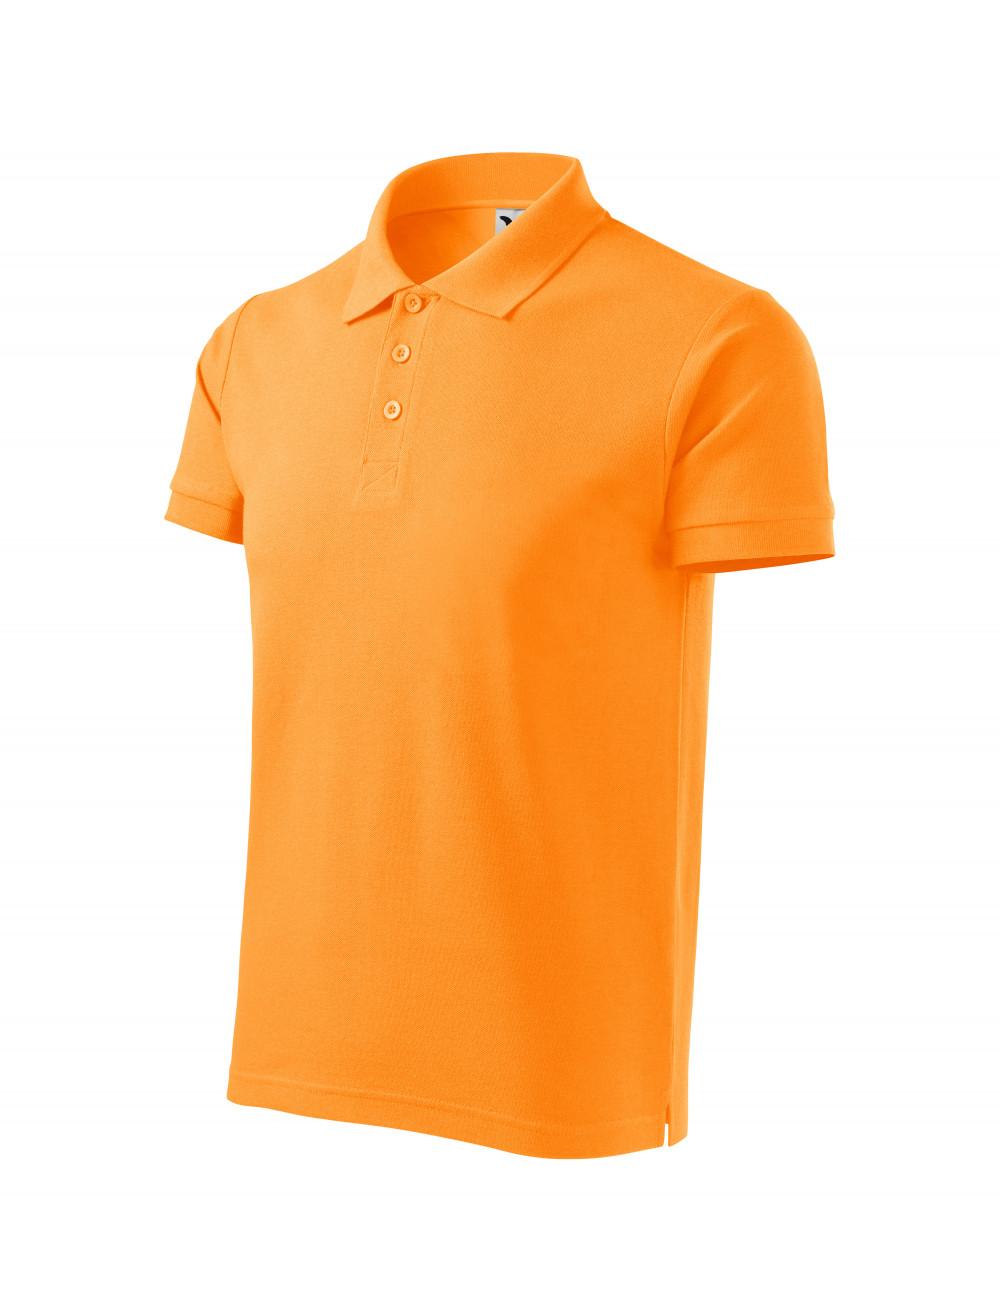 Adler MALFINI Koszulka polo męska Cotton Heavy 215 mandarynkowy